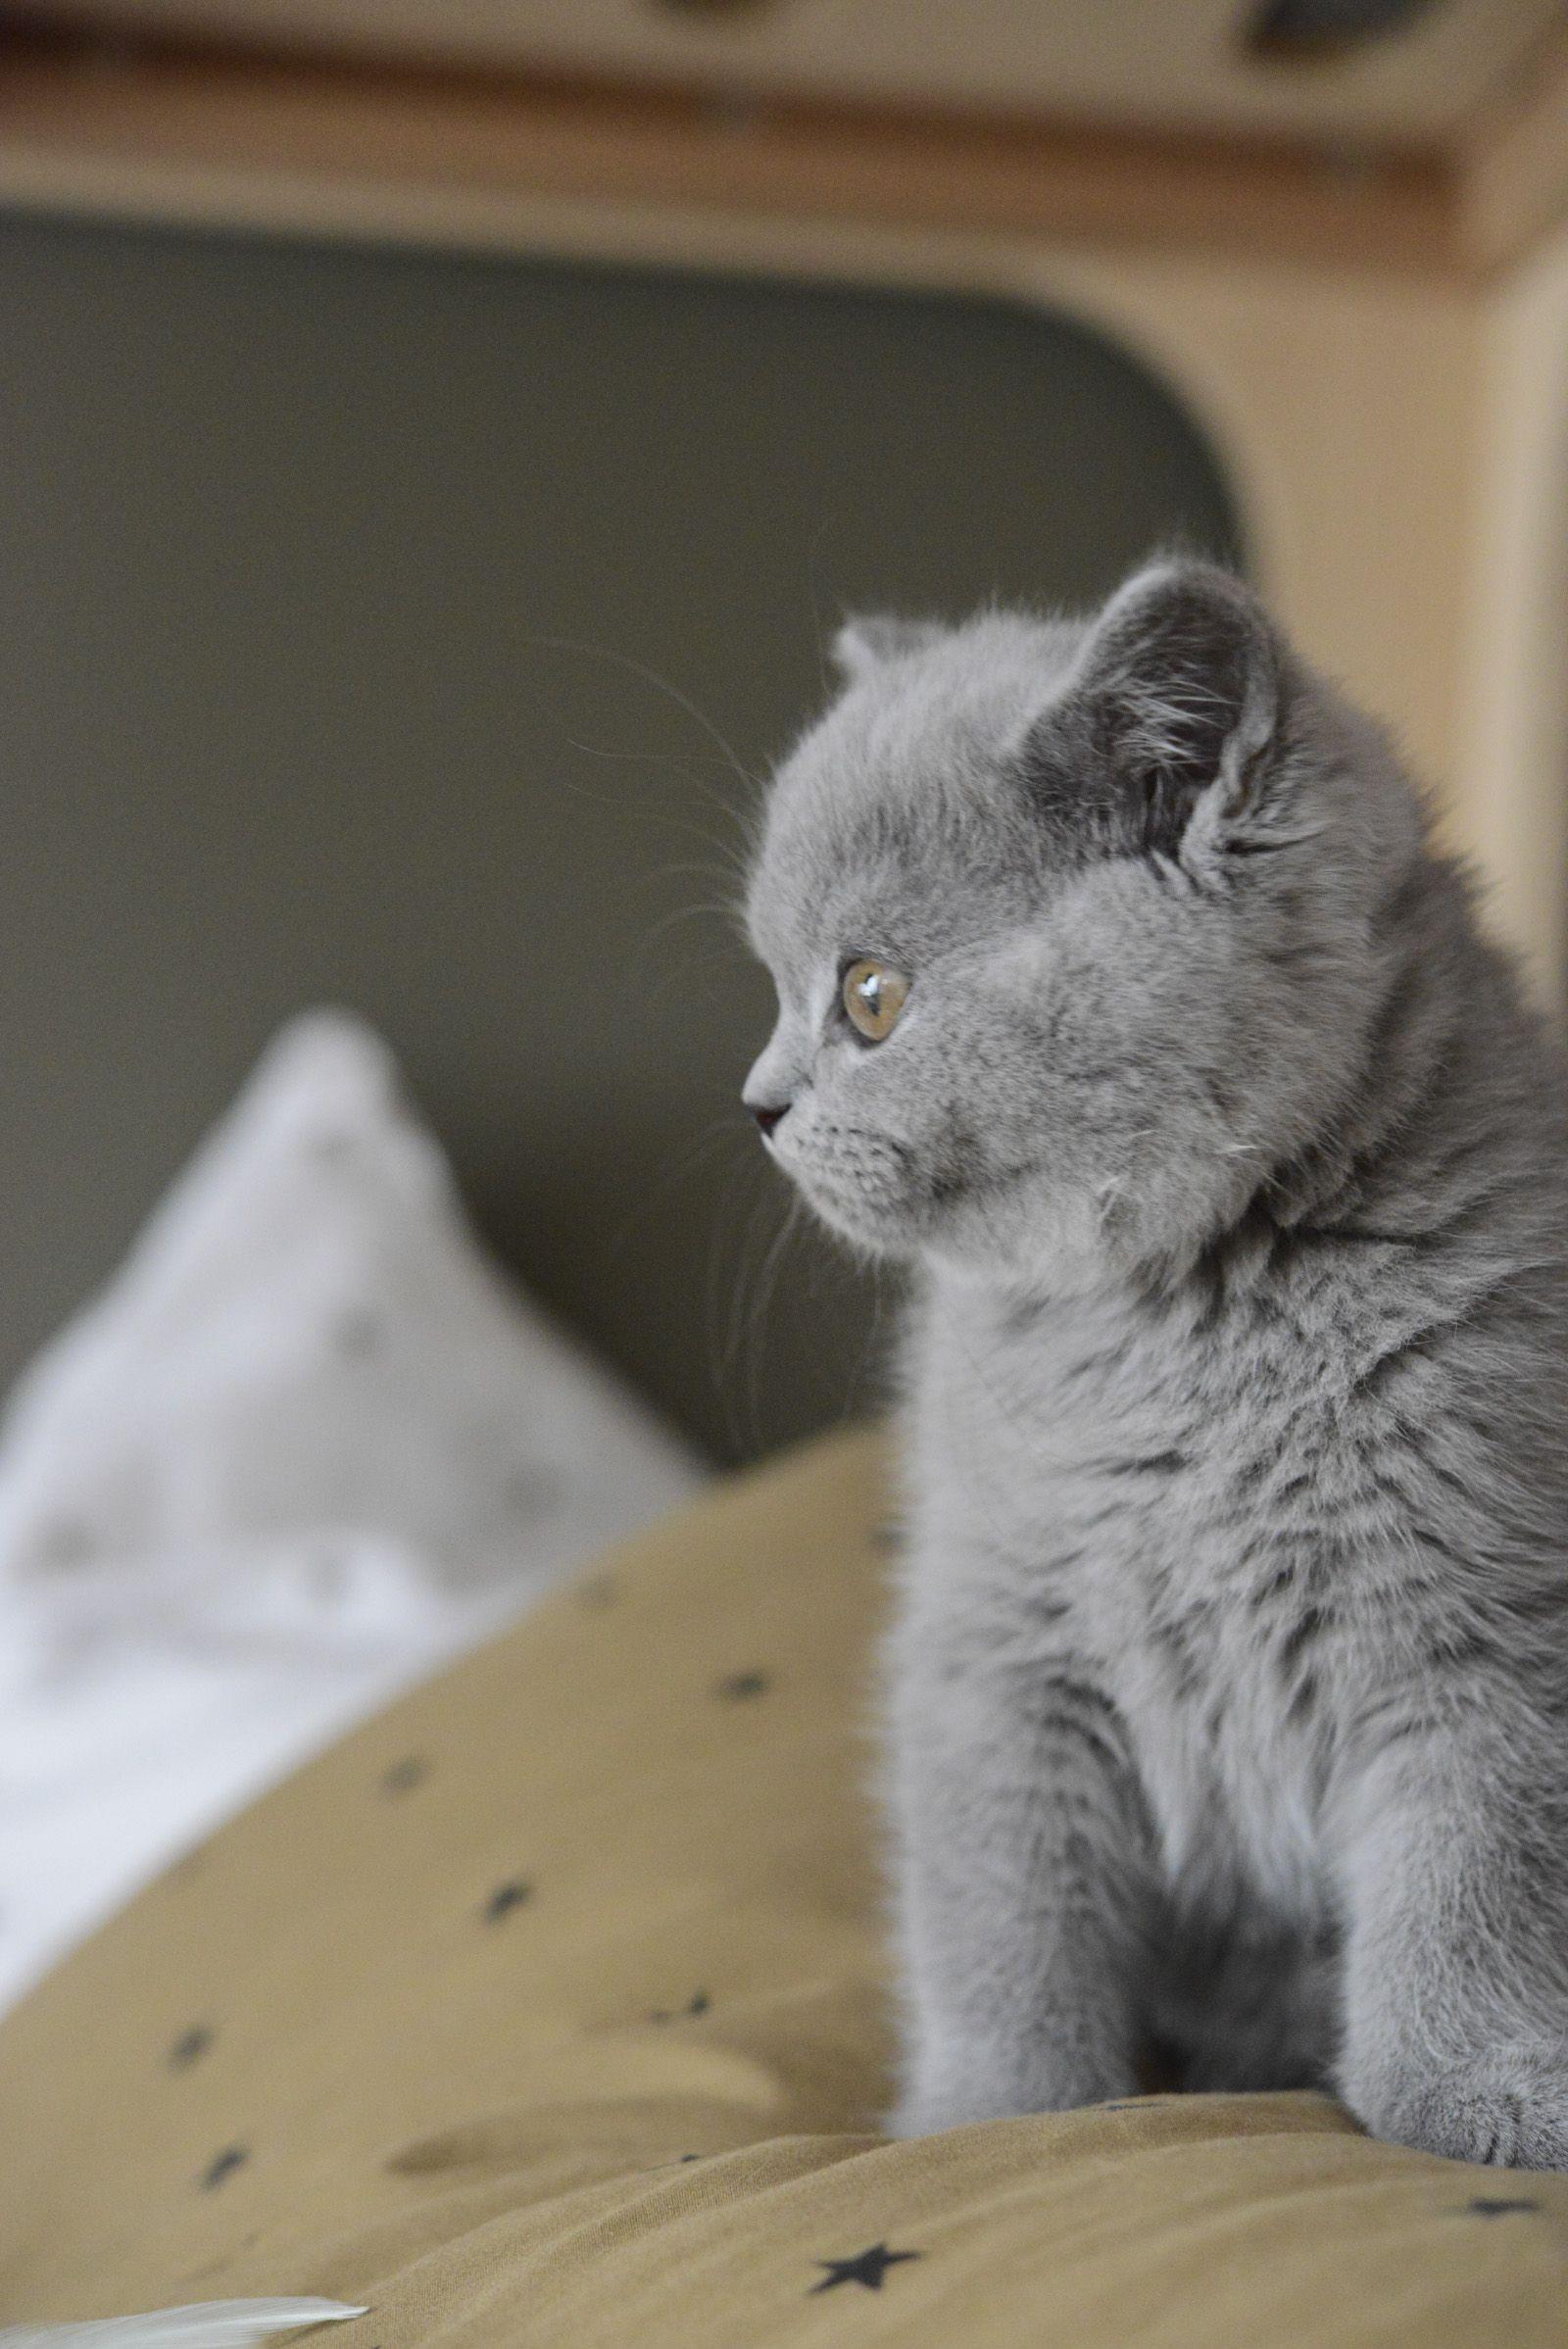 Mon British Shorthair British Shorthair Cats Cats Chartreux Cat